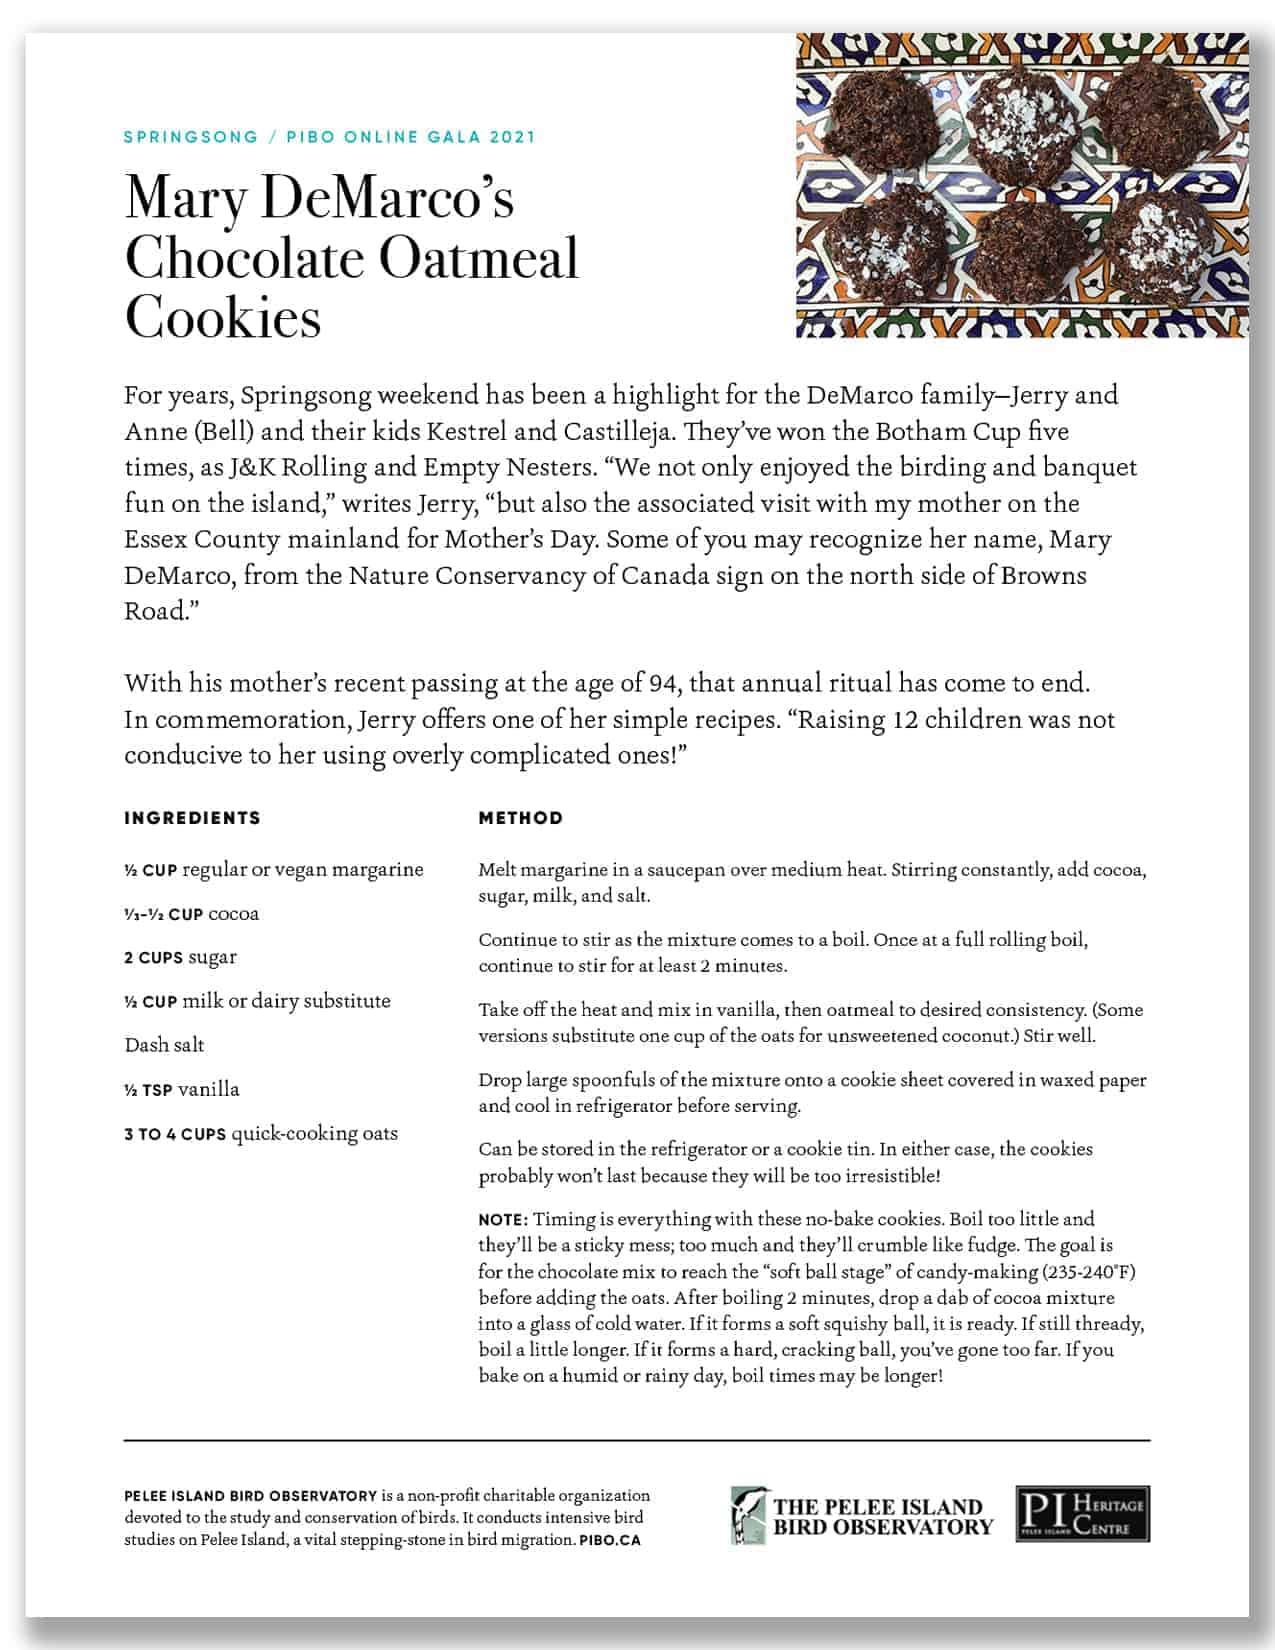 Mary Demarco's Chocolate Oatmeal Cookies